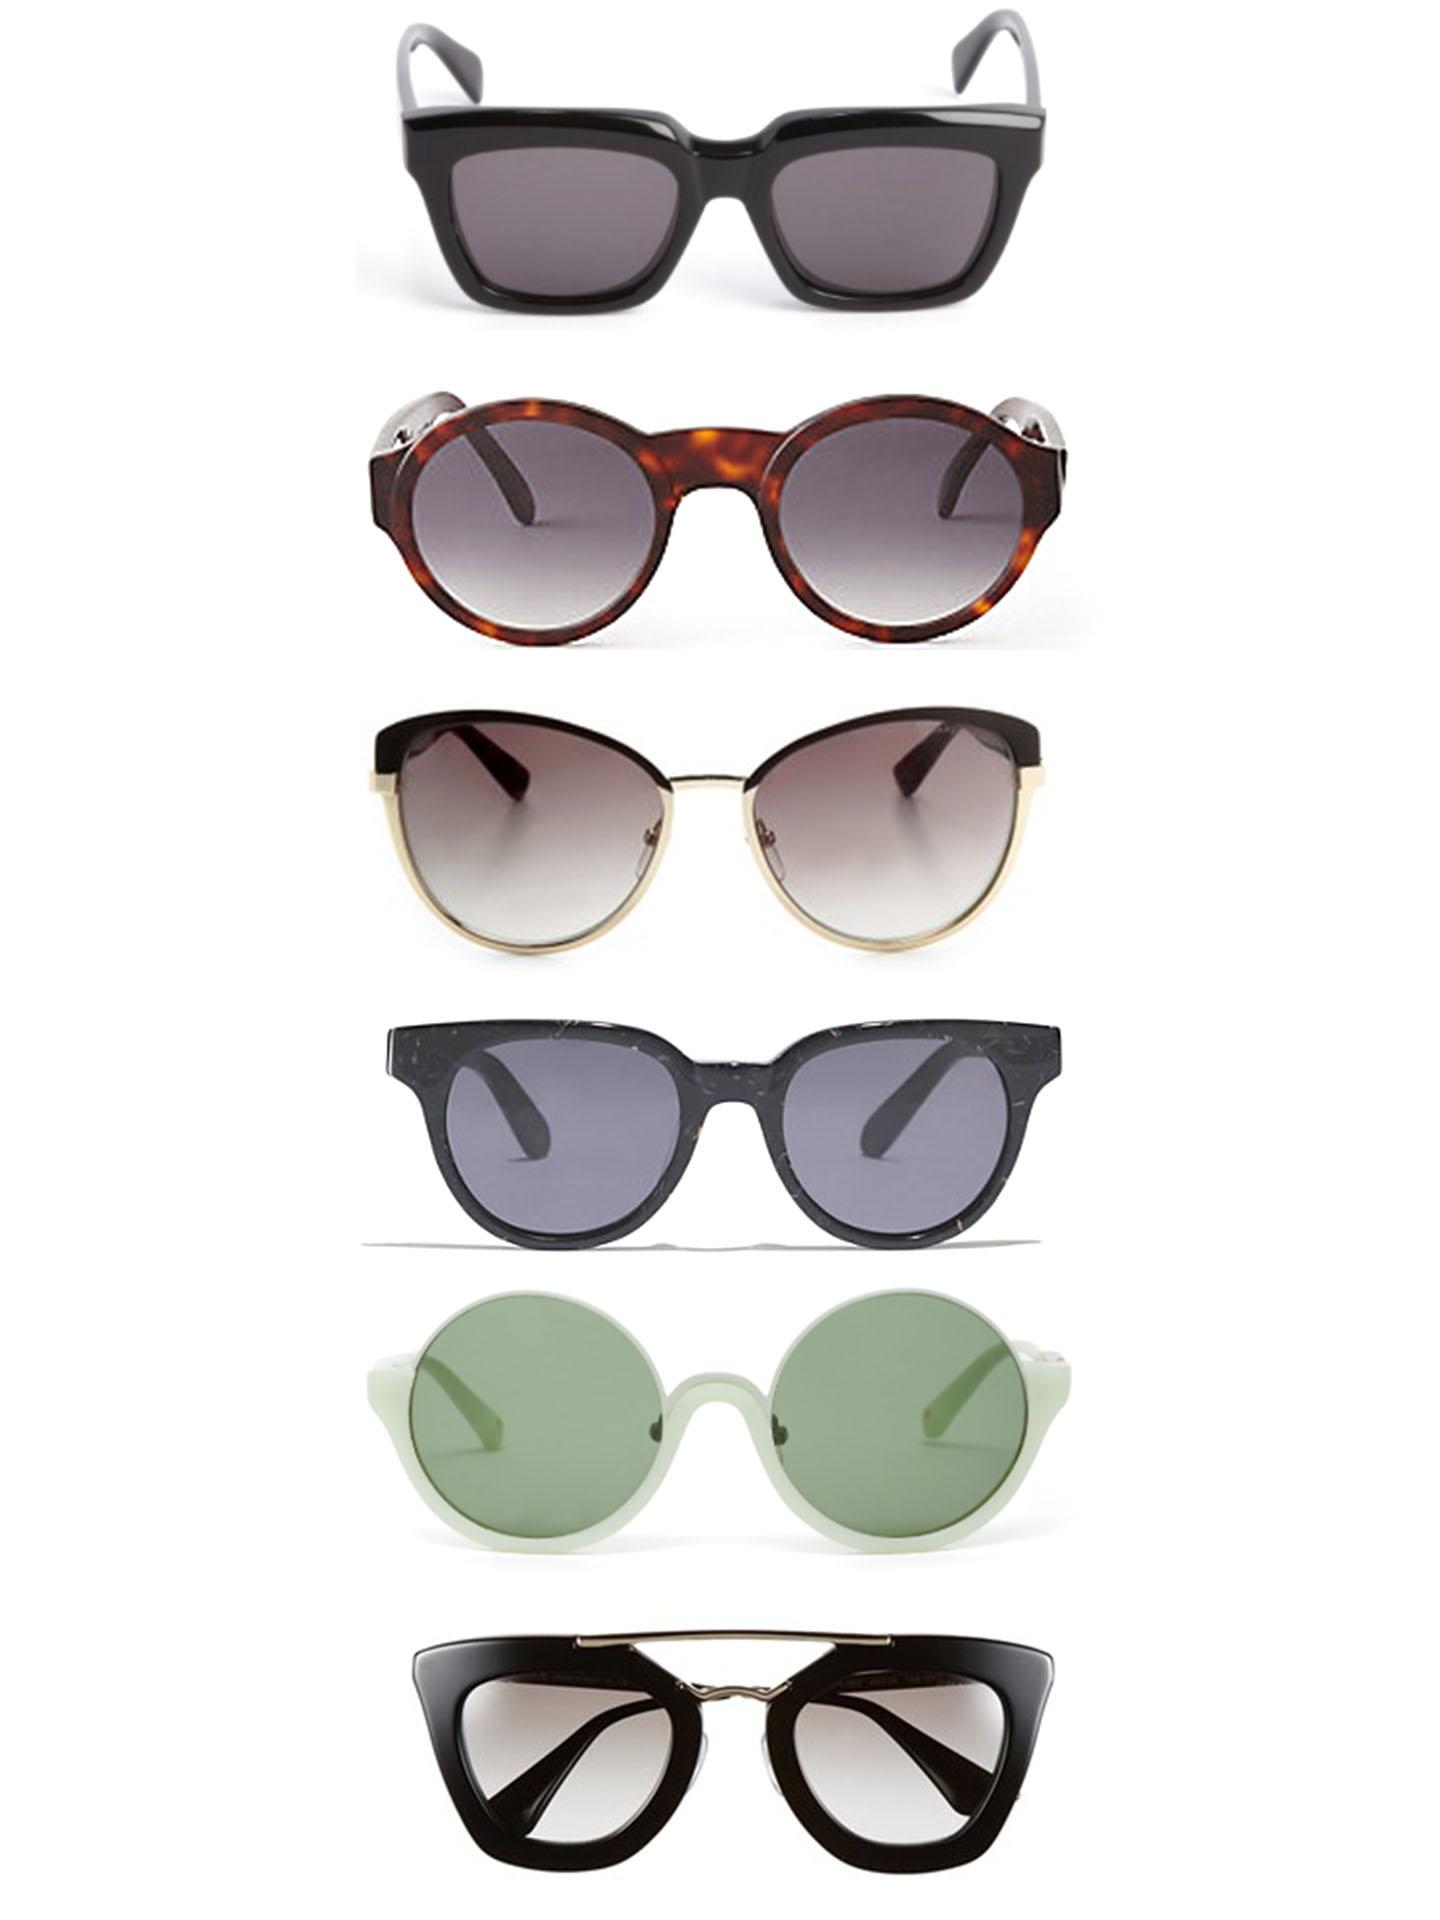 sunglasses_15